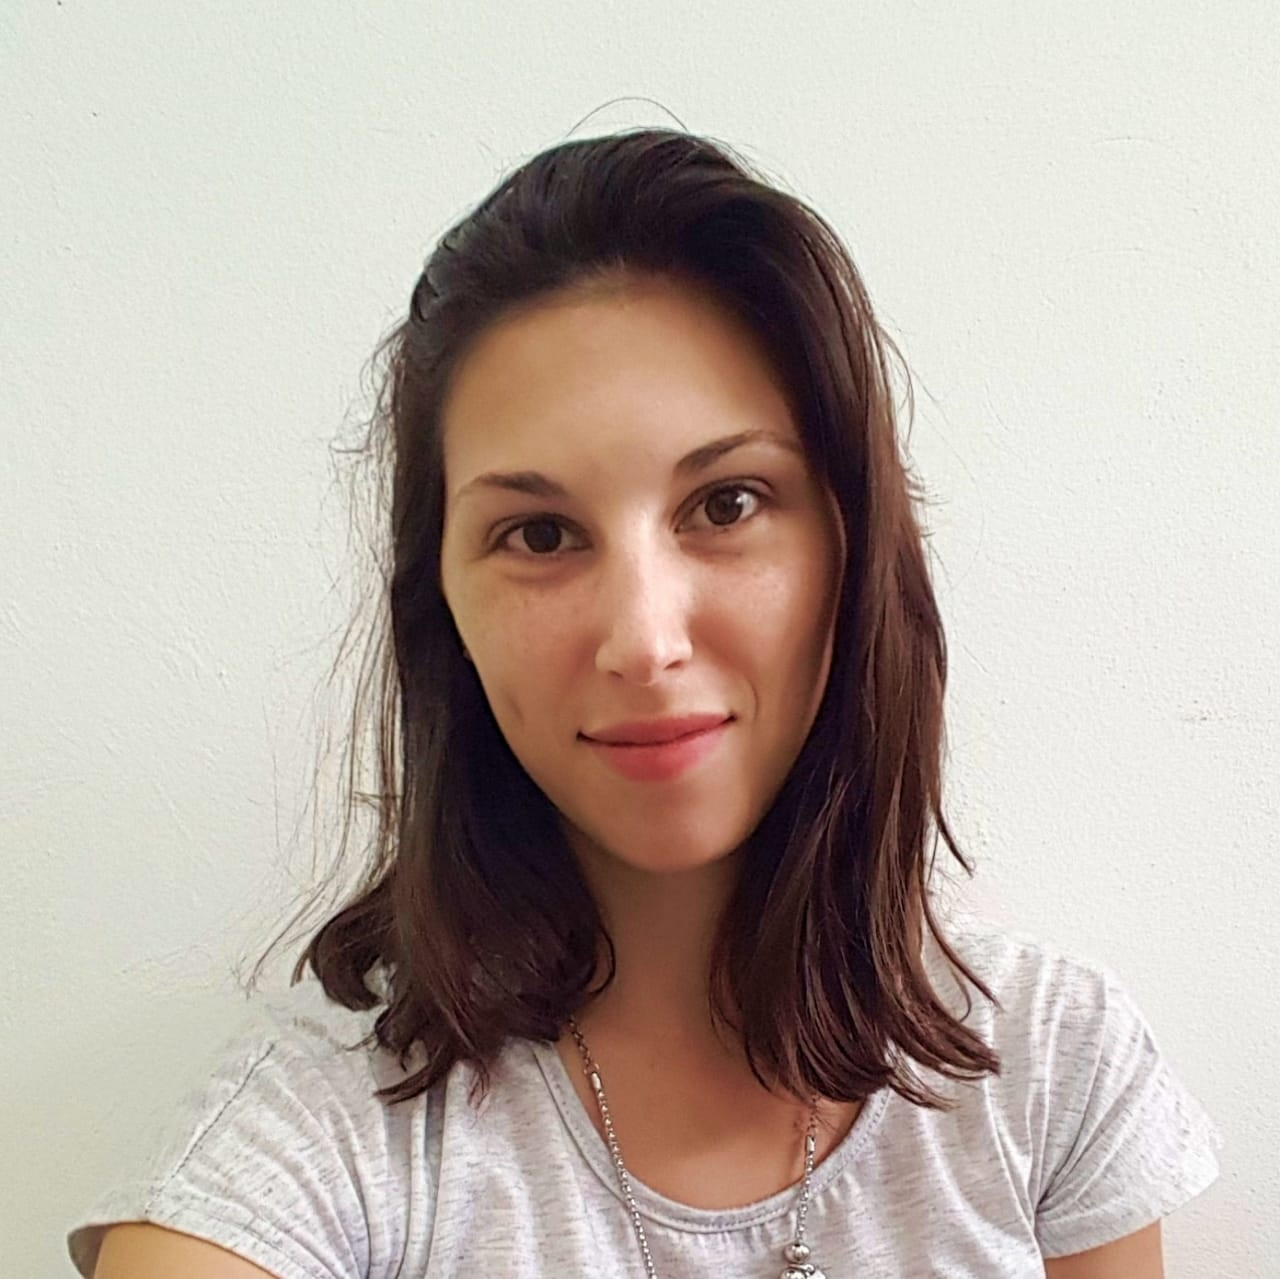 Agustina Silva